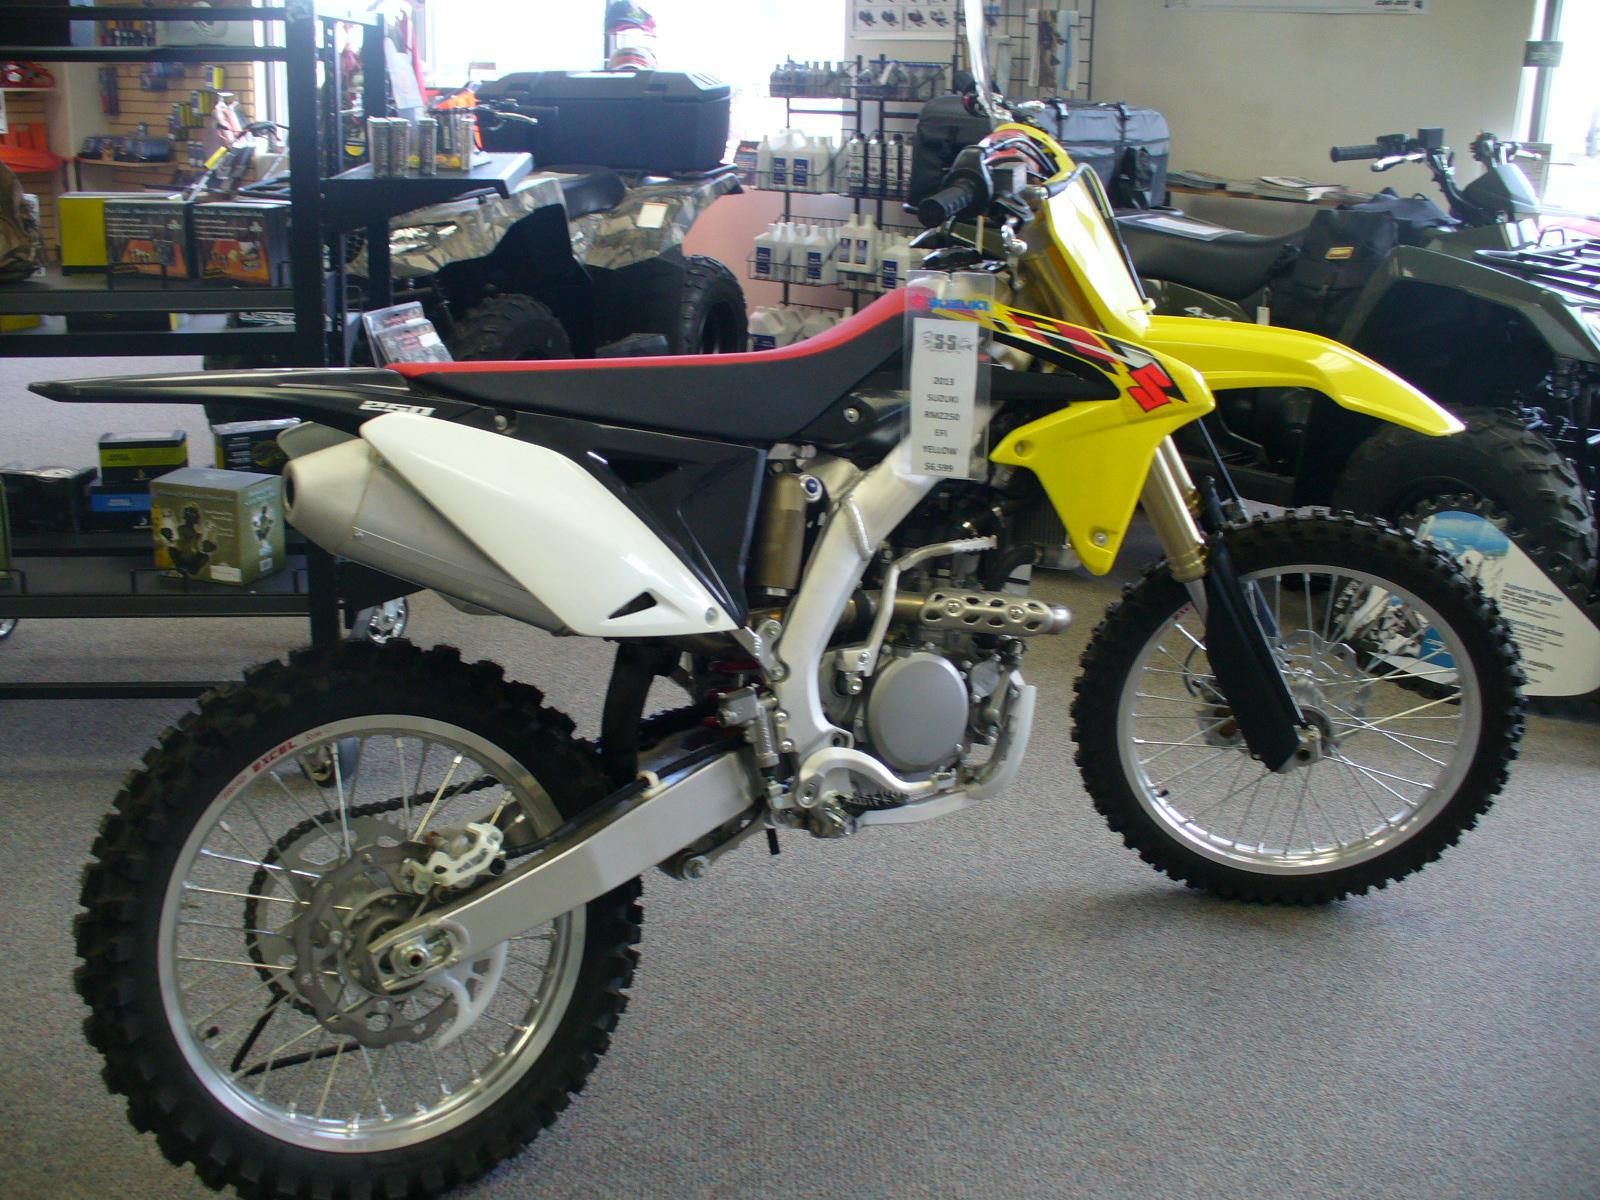 Suzuki Rmz 250 2013 Suzuki Rmz 250 For Sale In Thompson Falls Mt S Amp S Sports